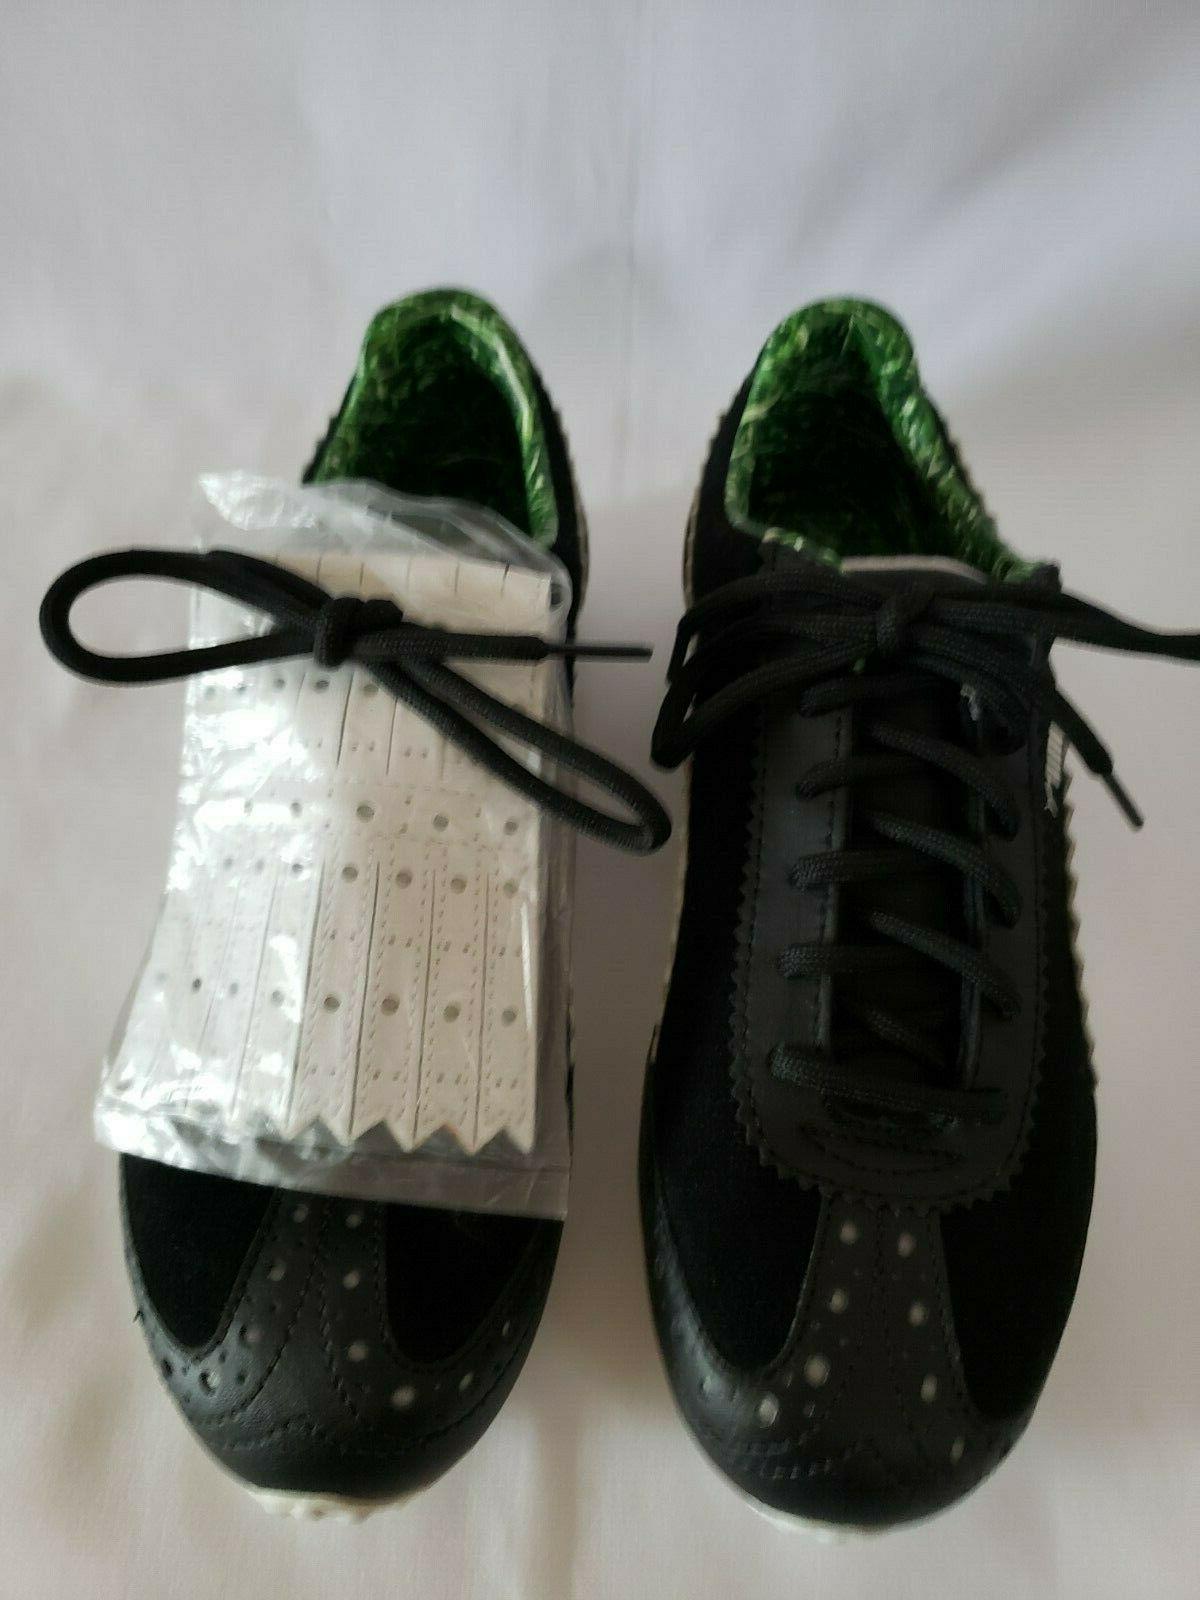 PUMA Oxford Shoes Kiltie Spikeless 8